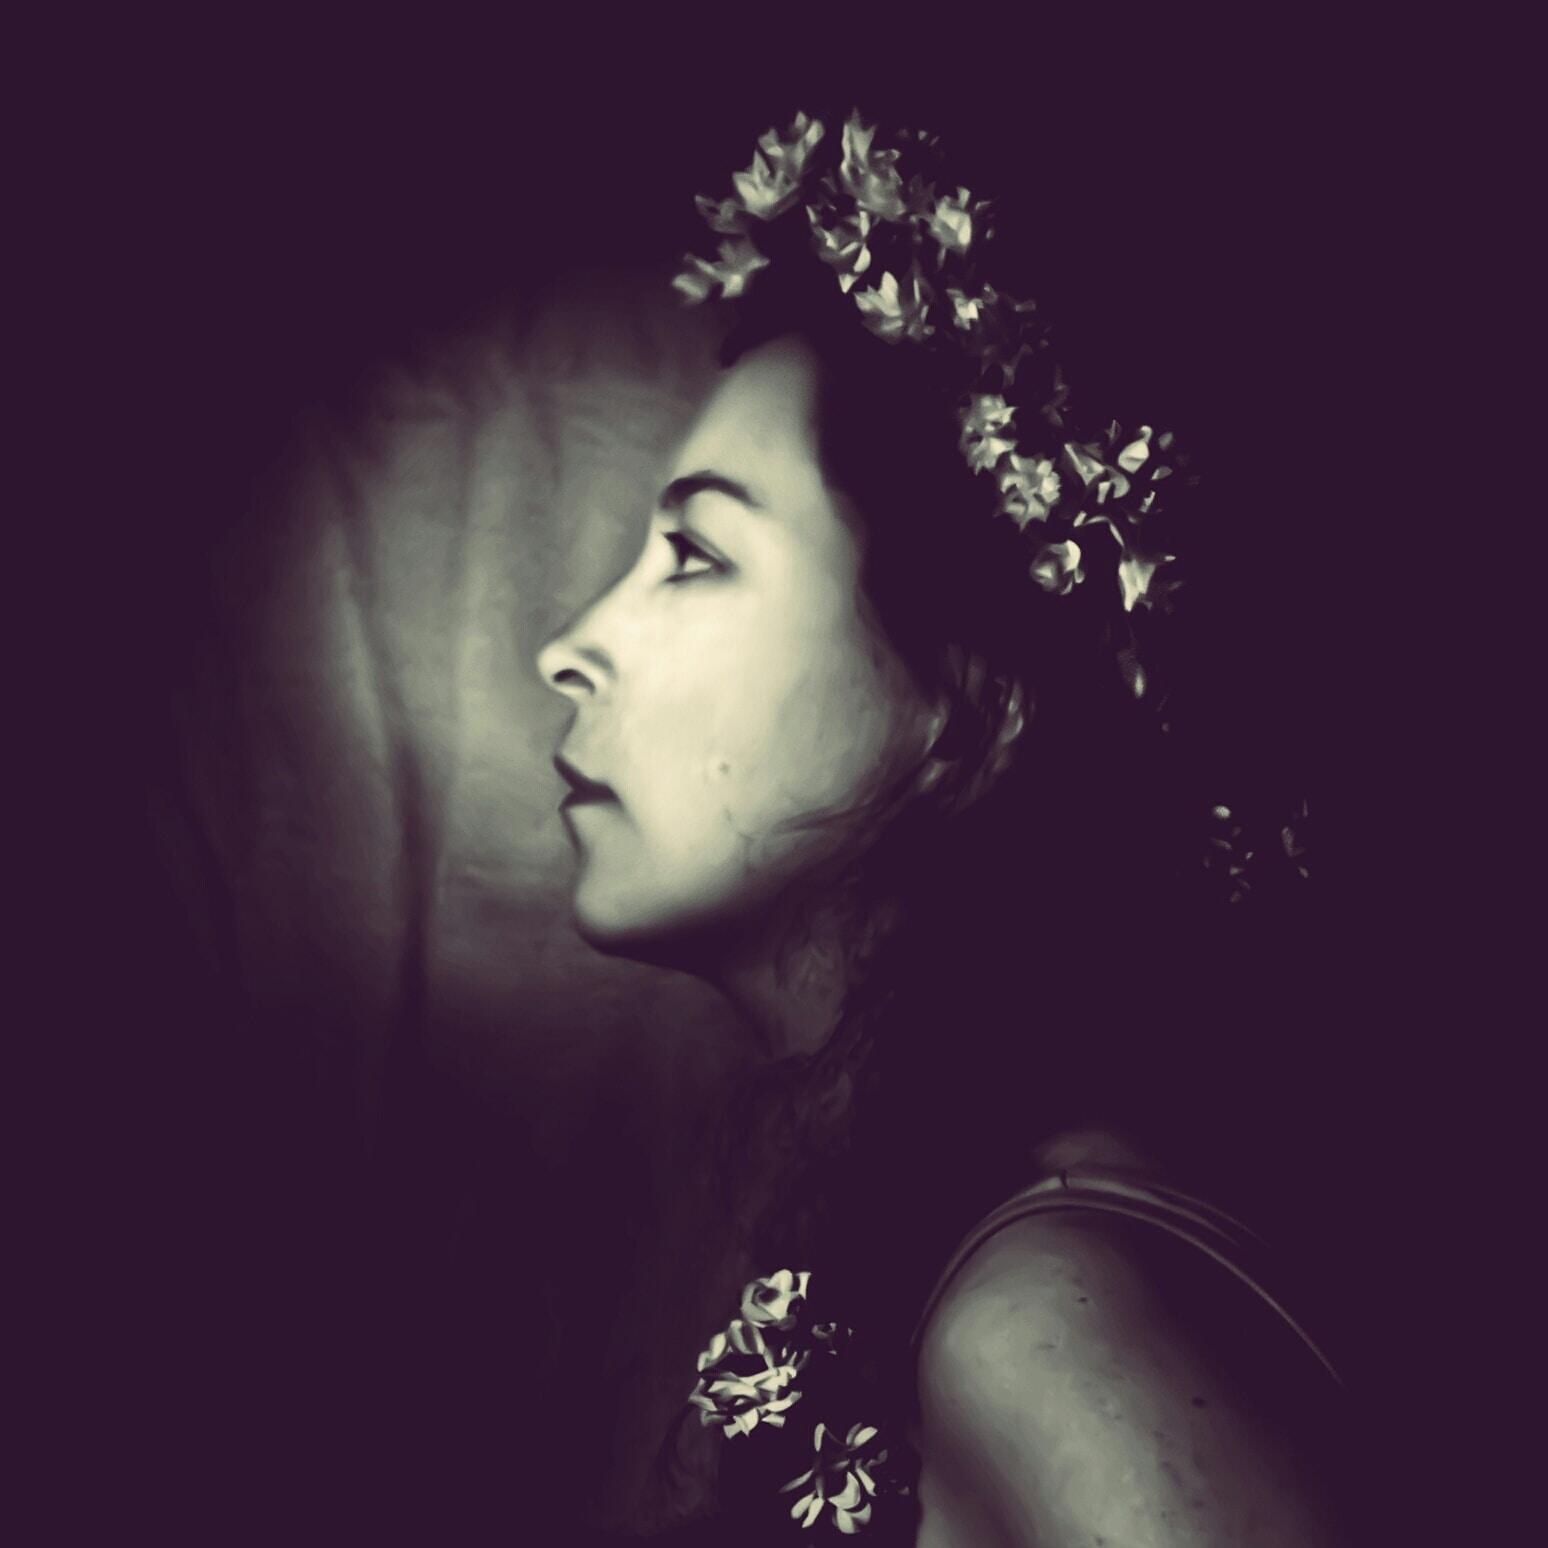 Go to Anna Prigkipaki's profile